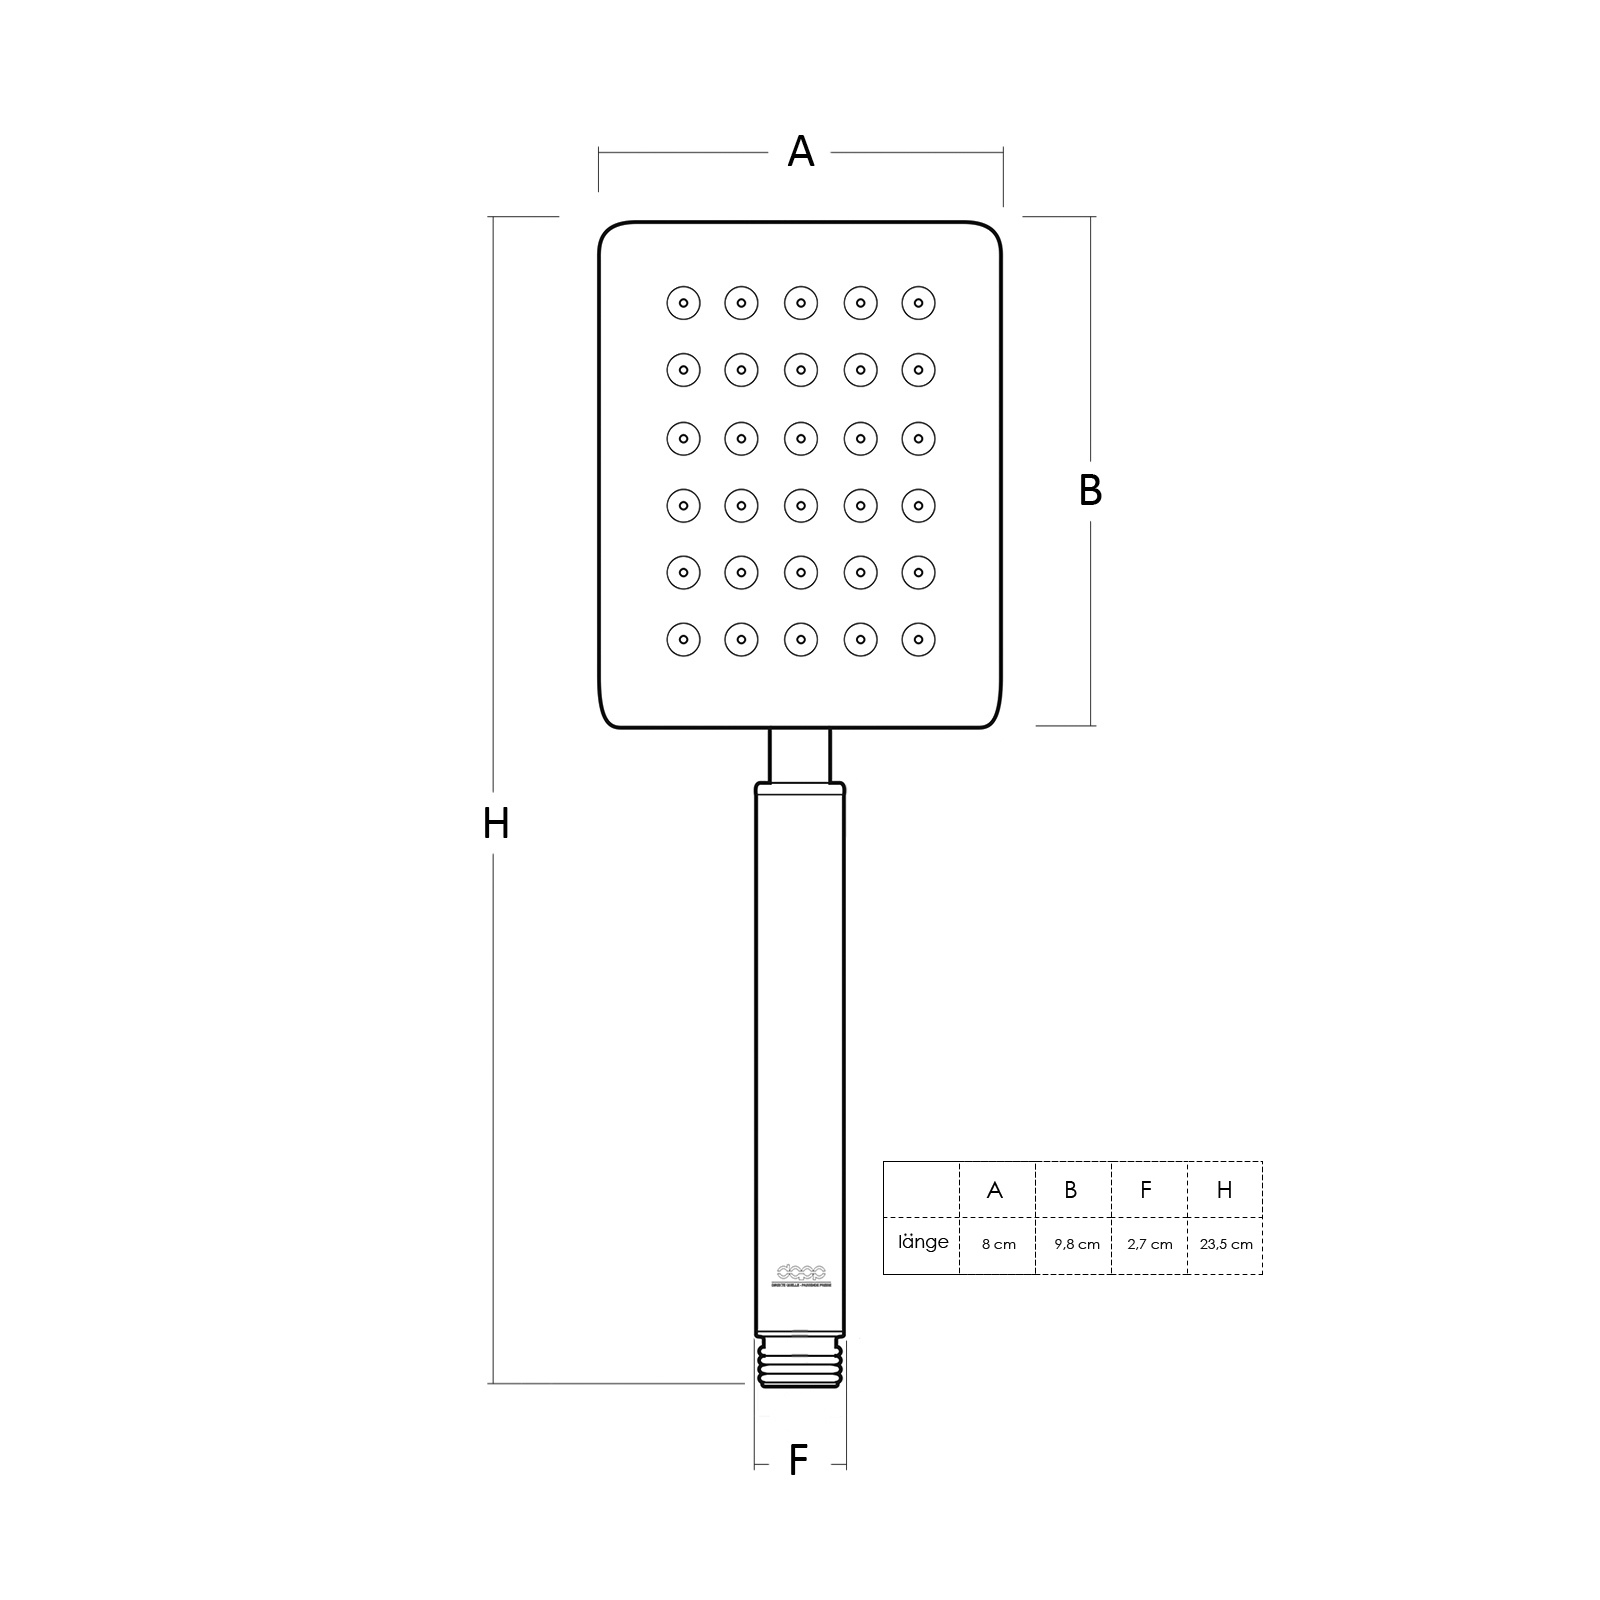 SET 2-Teilig Stabhandbrause mit Brauseschlauch PVC 1500mm Chrom Armatur